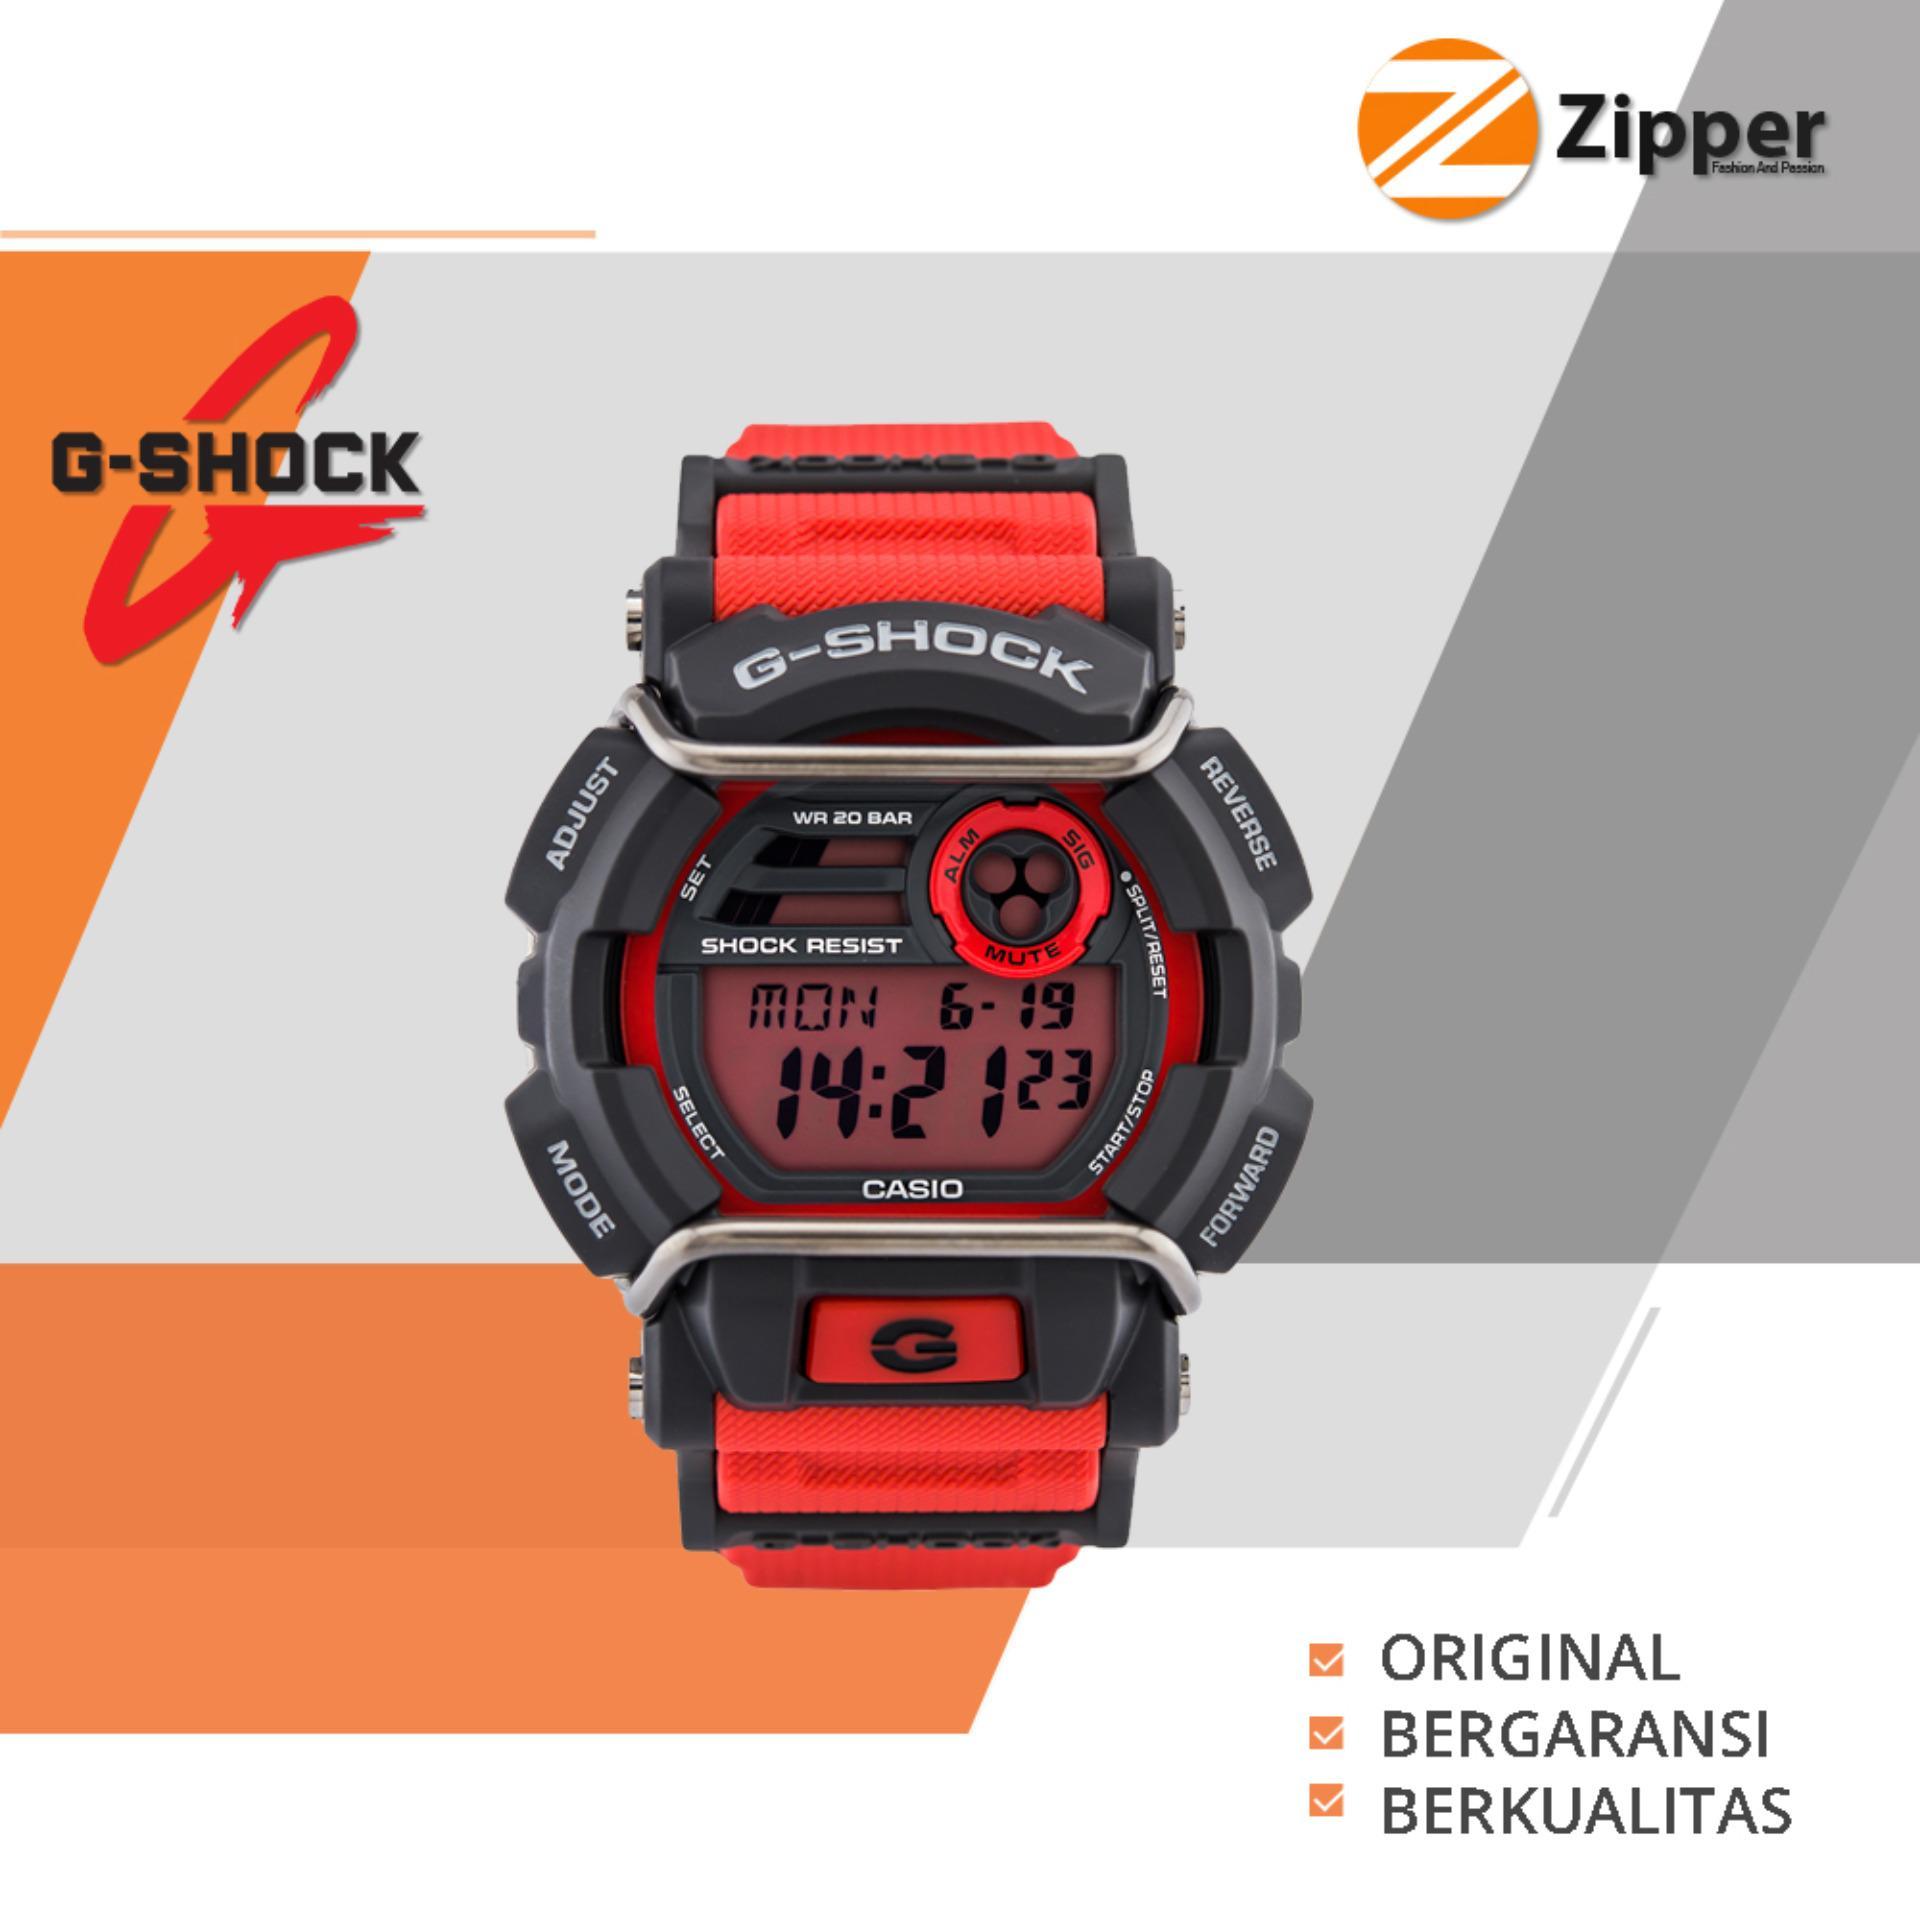 Beli Promo Casio G Shock Jam Tangan Pria Gd 400 Series Kredit Jawa Timur